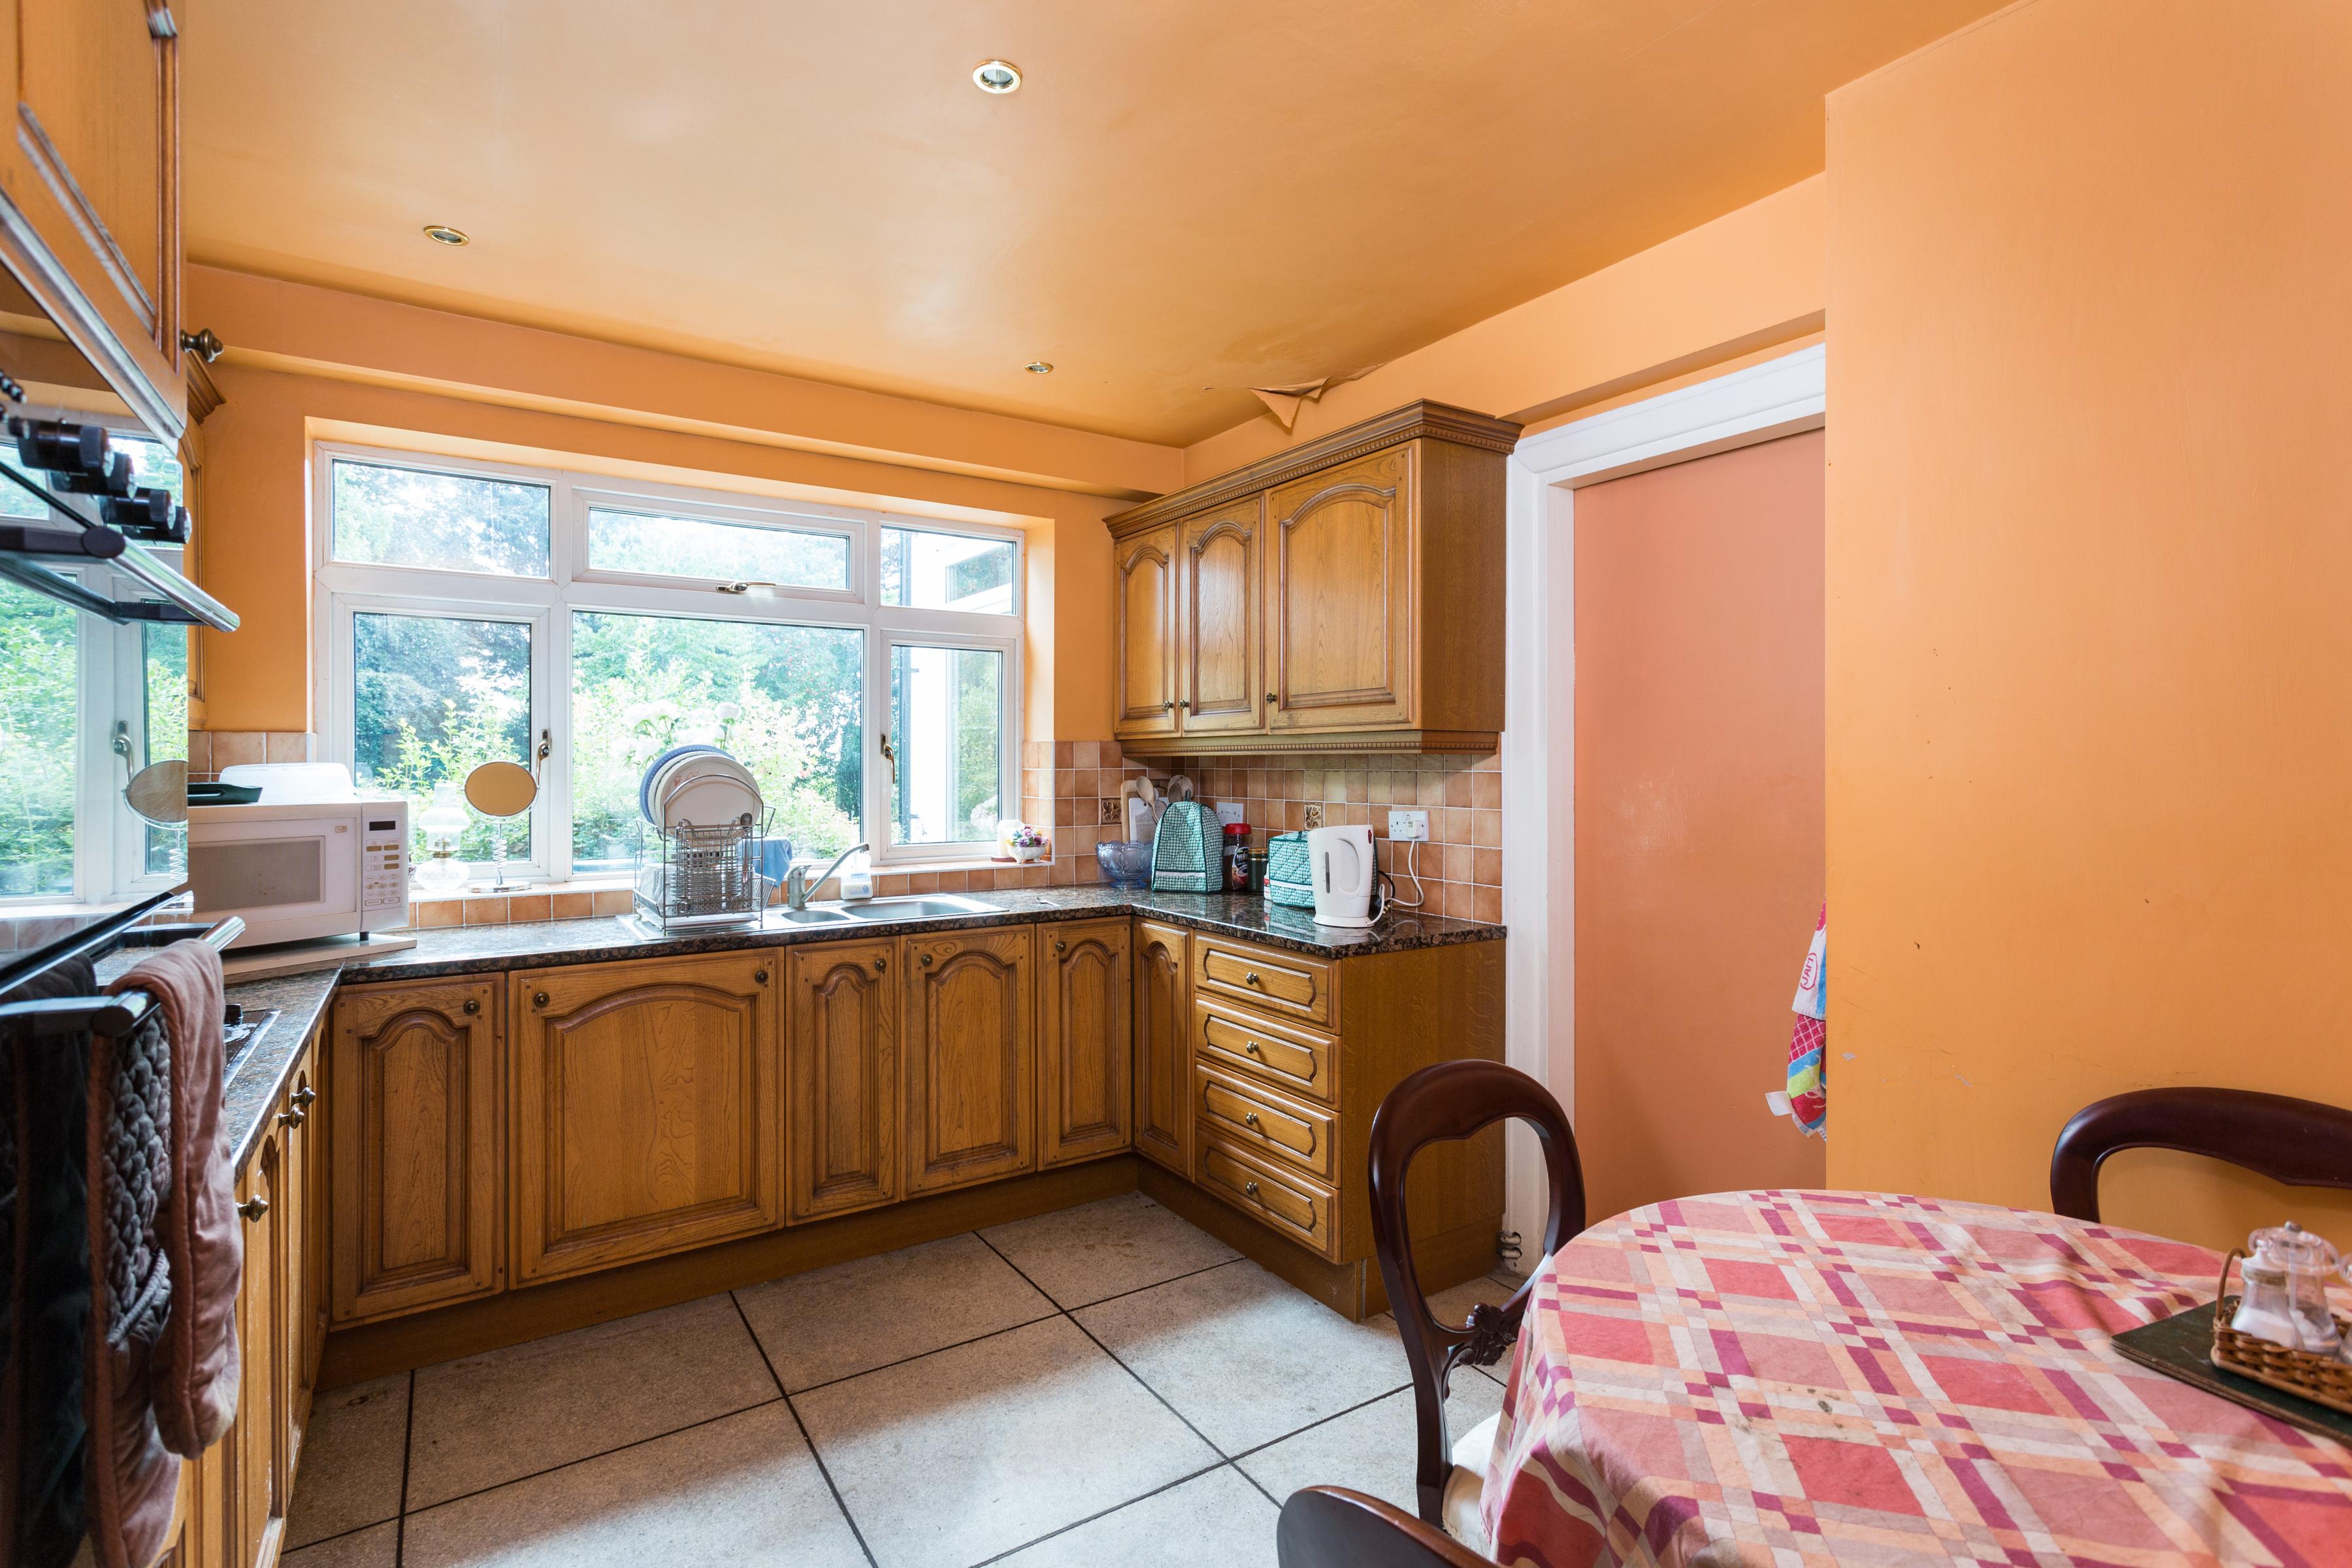 53 Hillfield House, Askham Lane, York - property photo #6